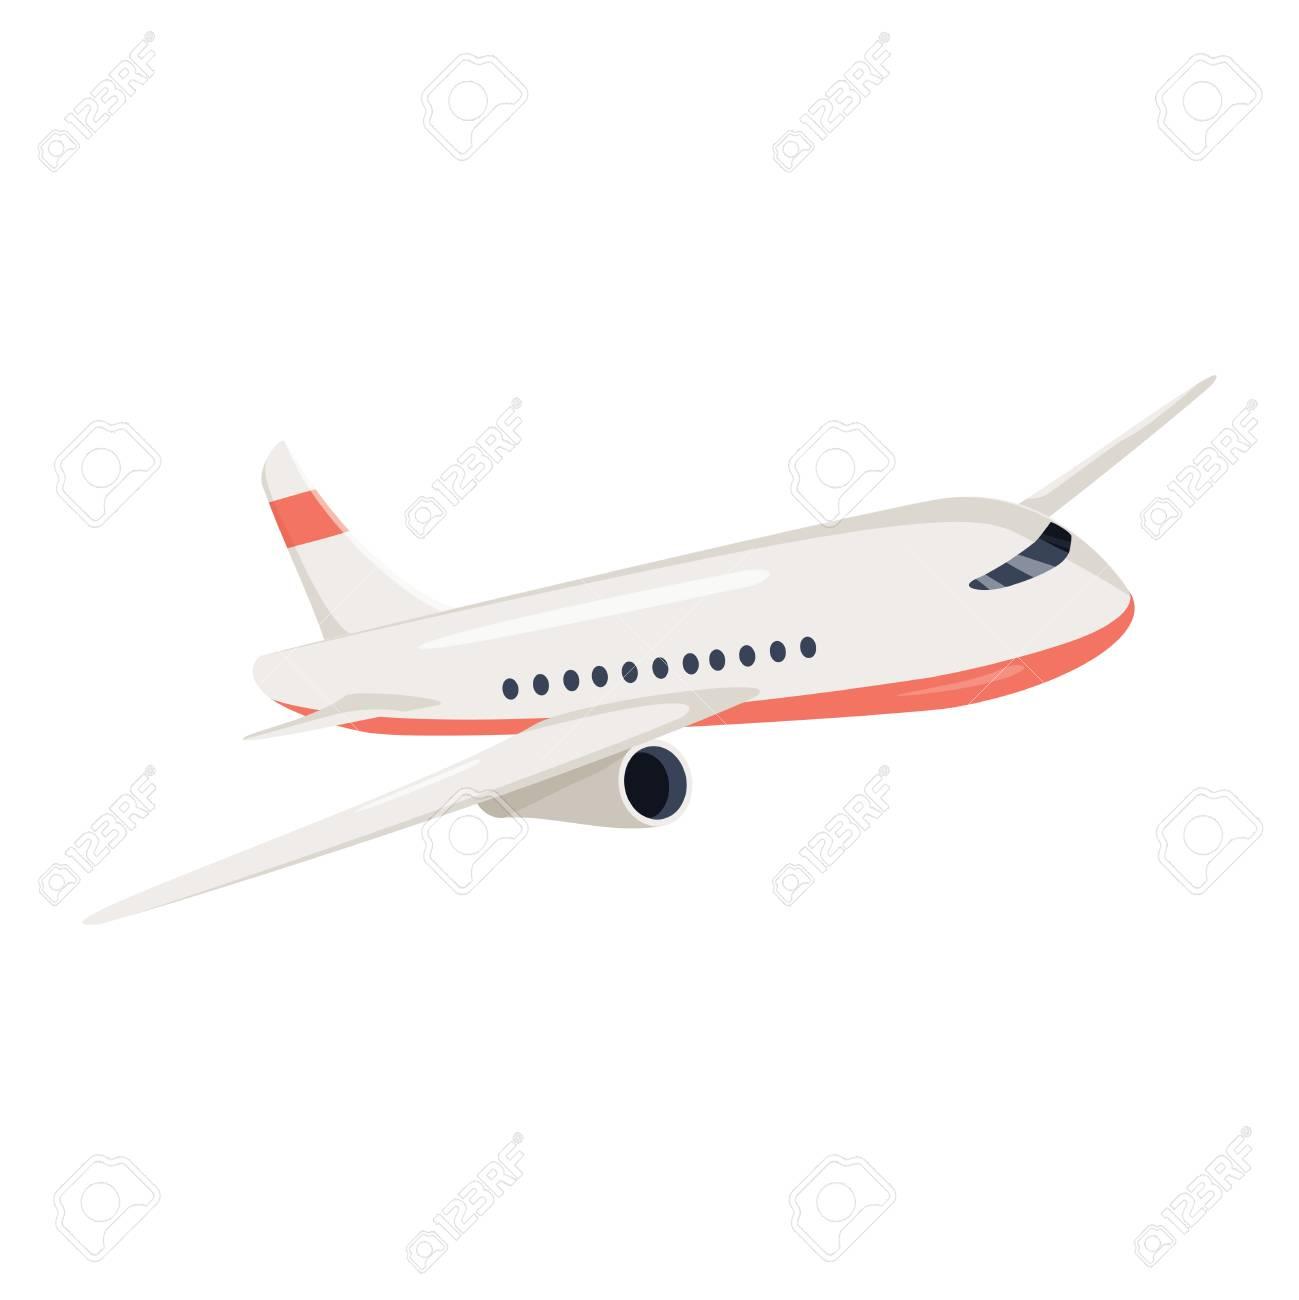 aeroplane icon vector illustration